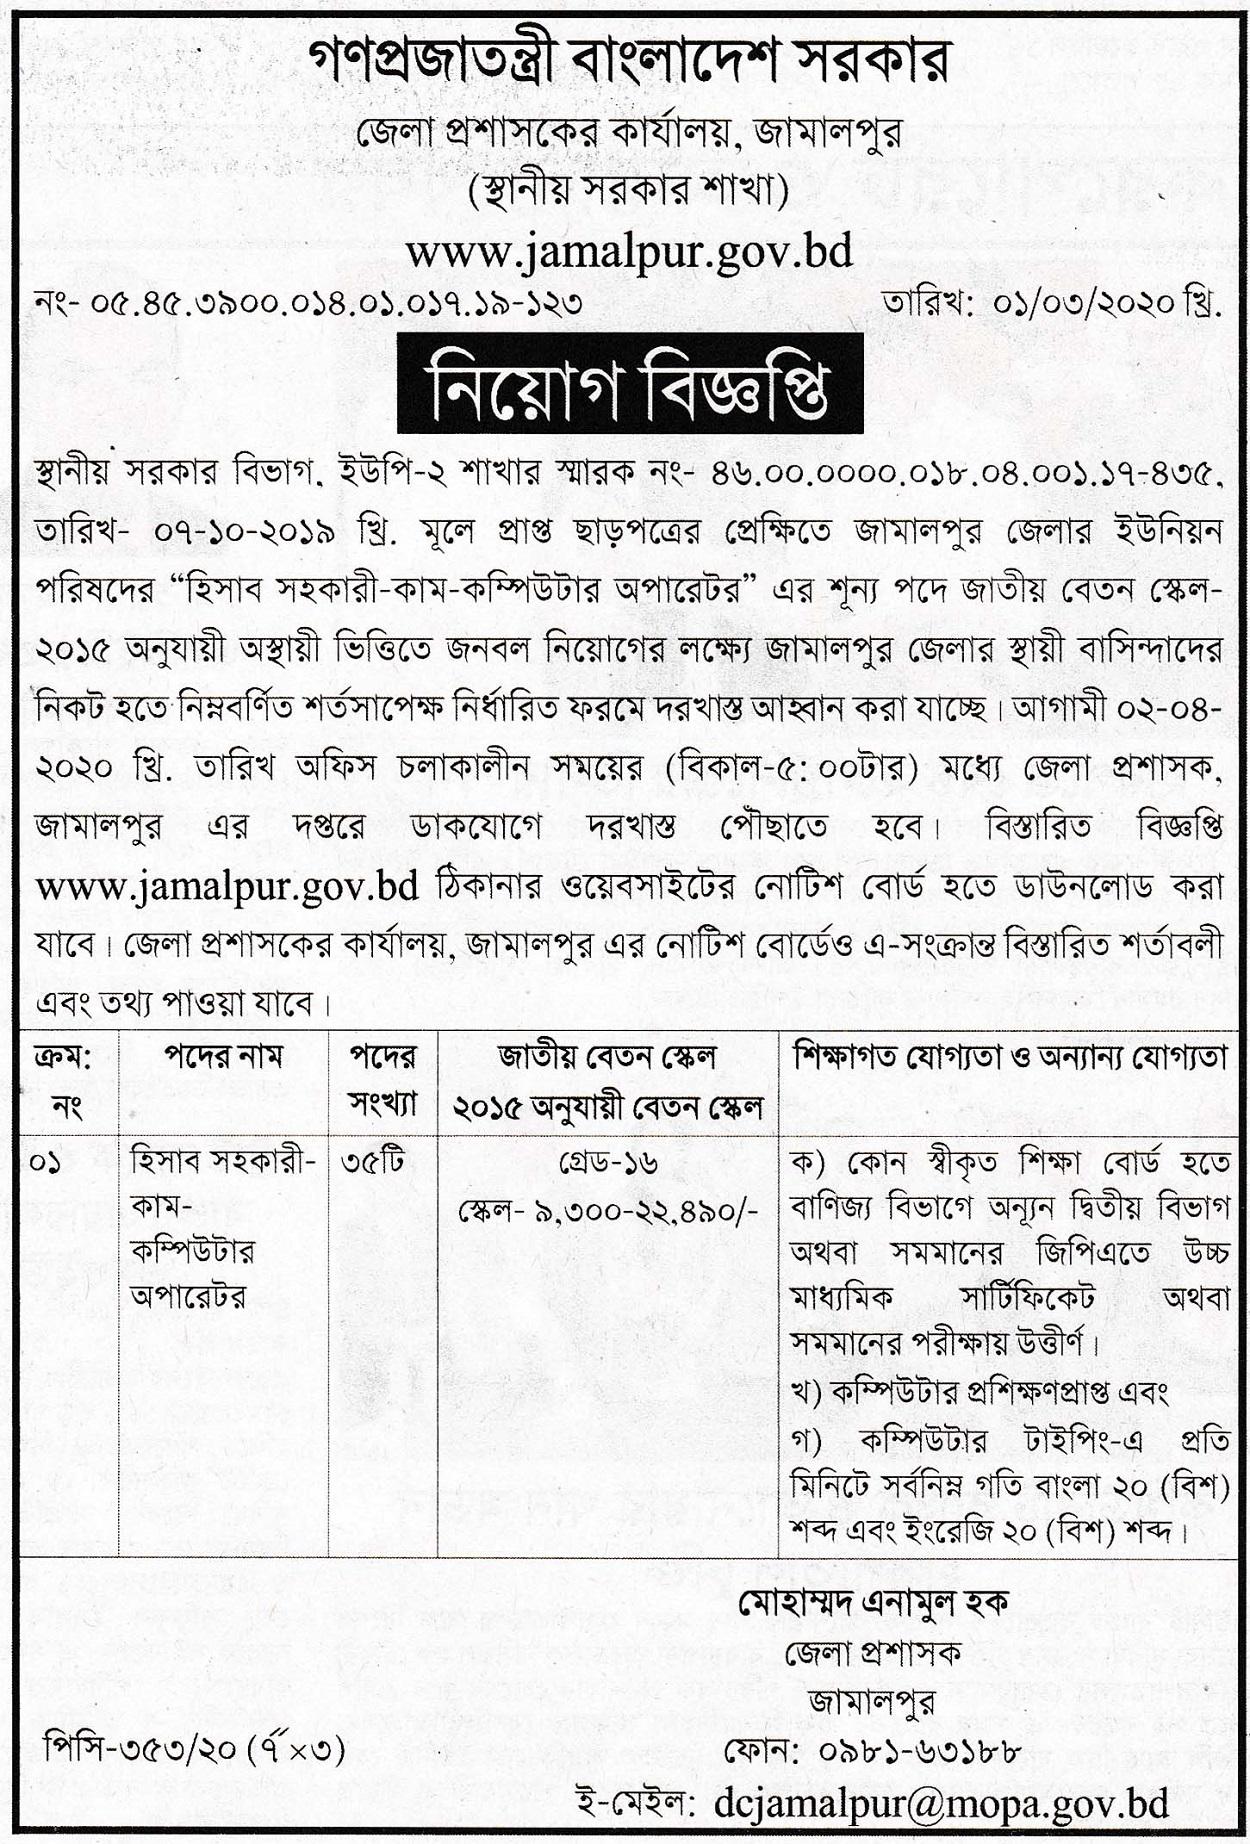 Jamalpur Deputy Commissioner's Office Job Circular 2020